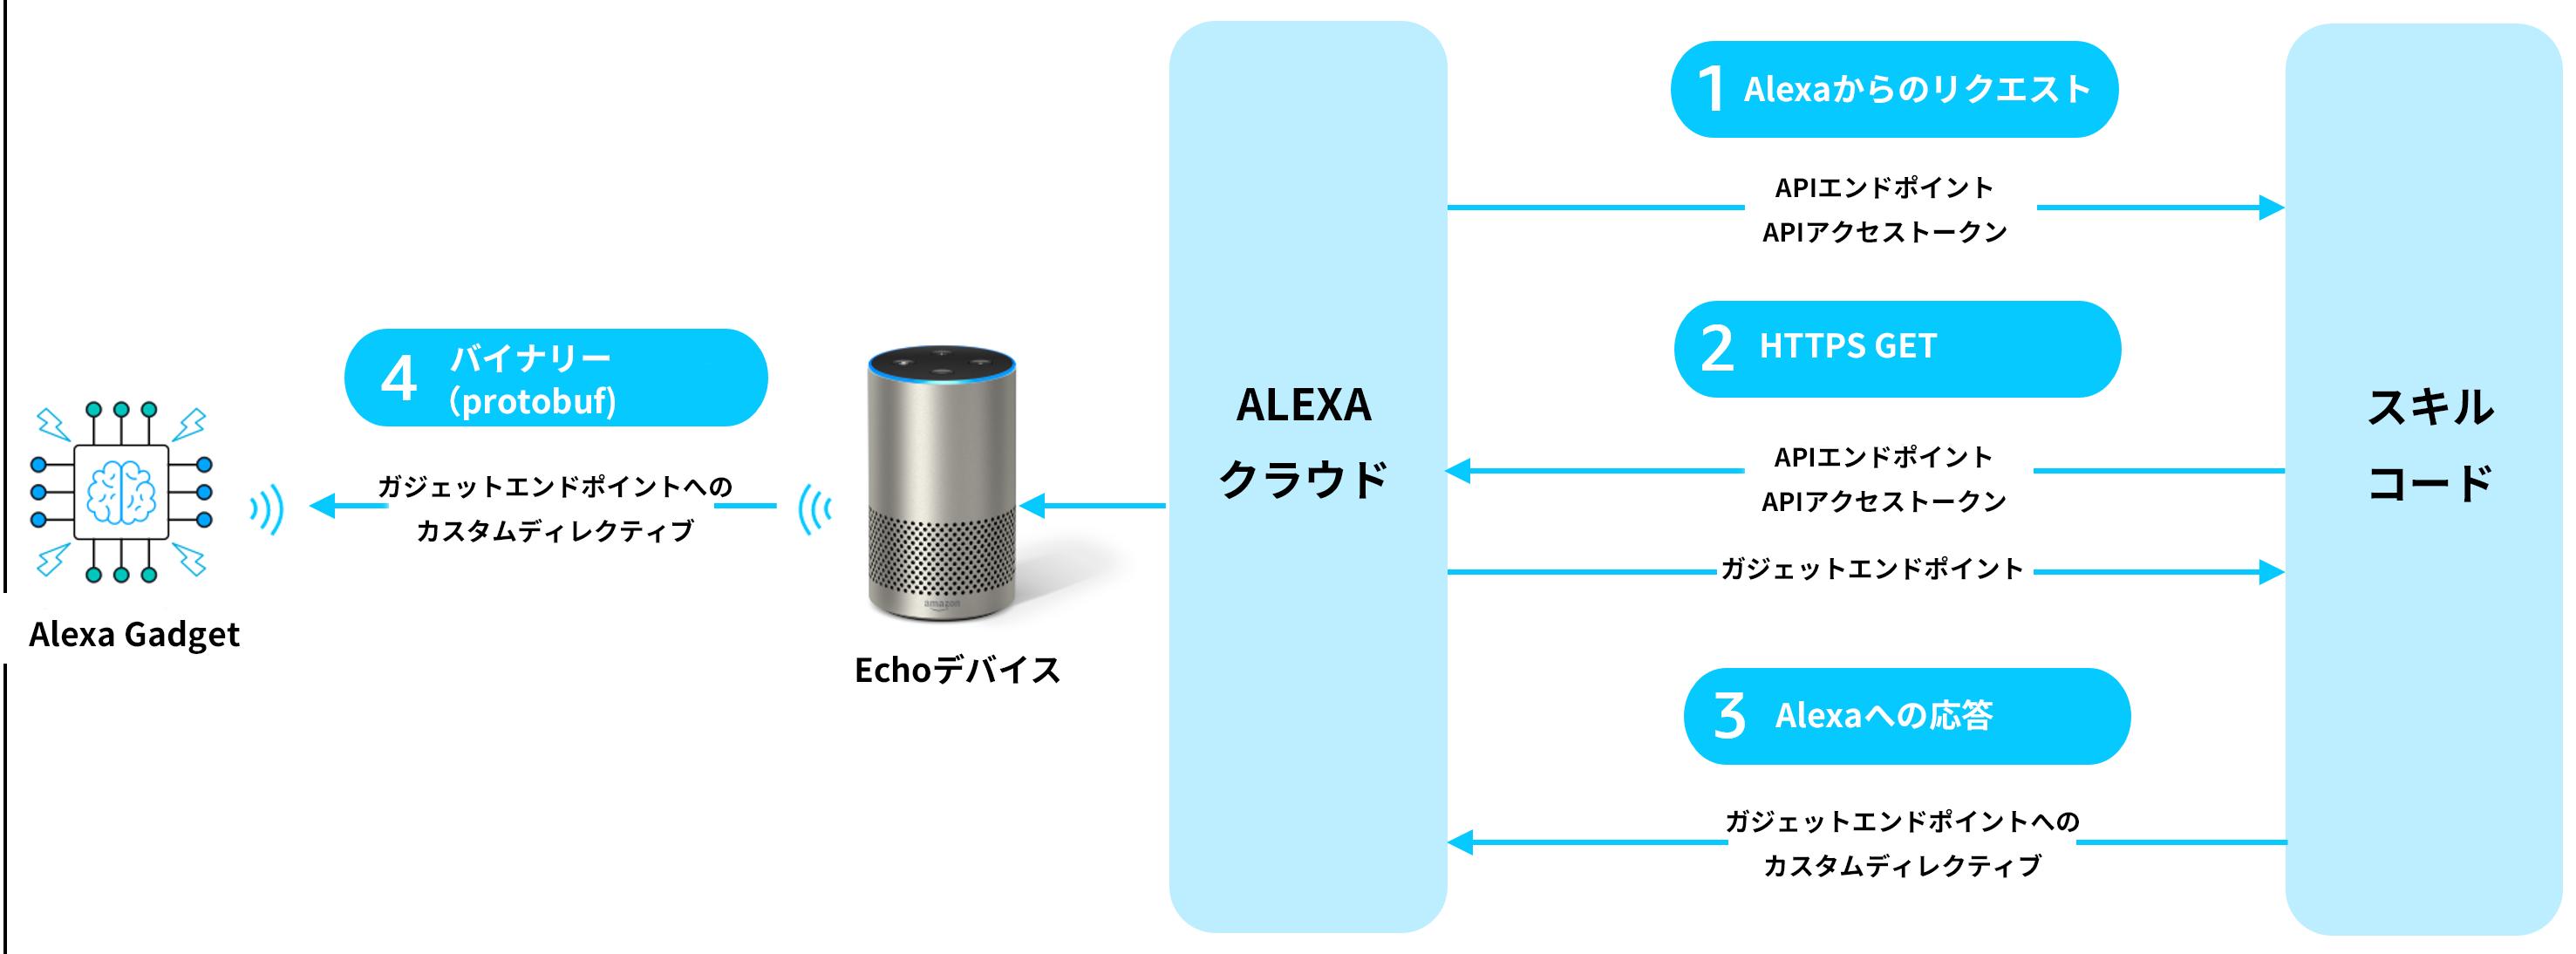 Alexa Gadgetにカスタムディレクティブを送信する